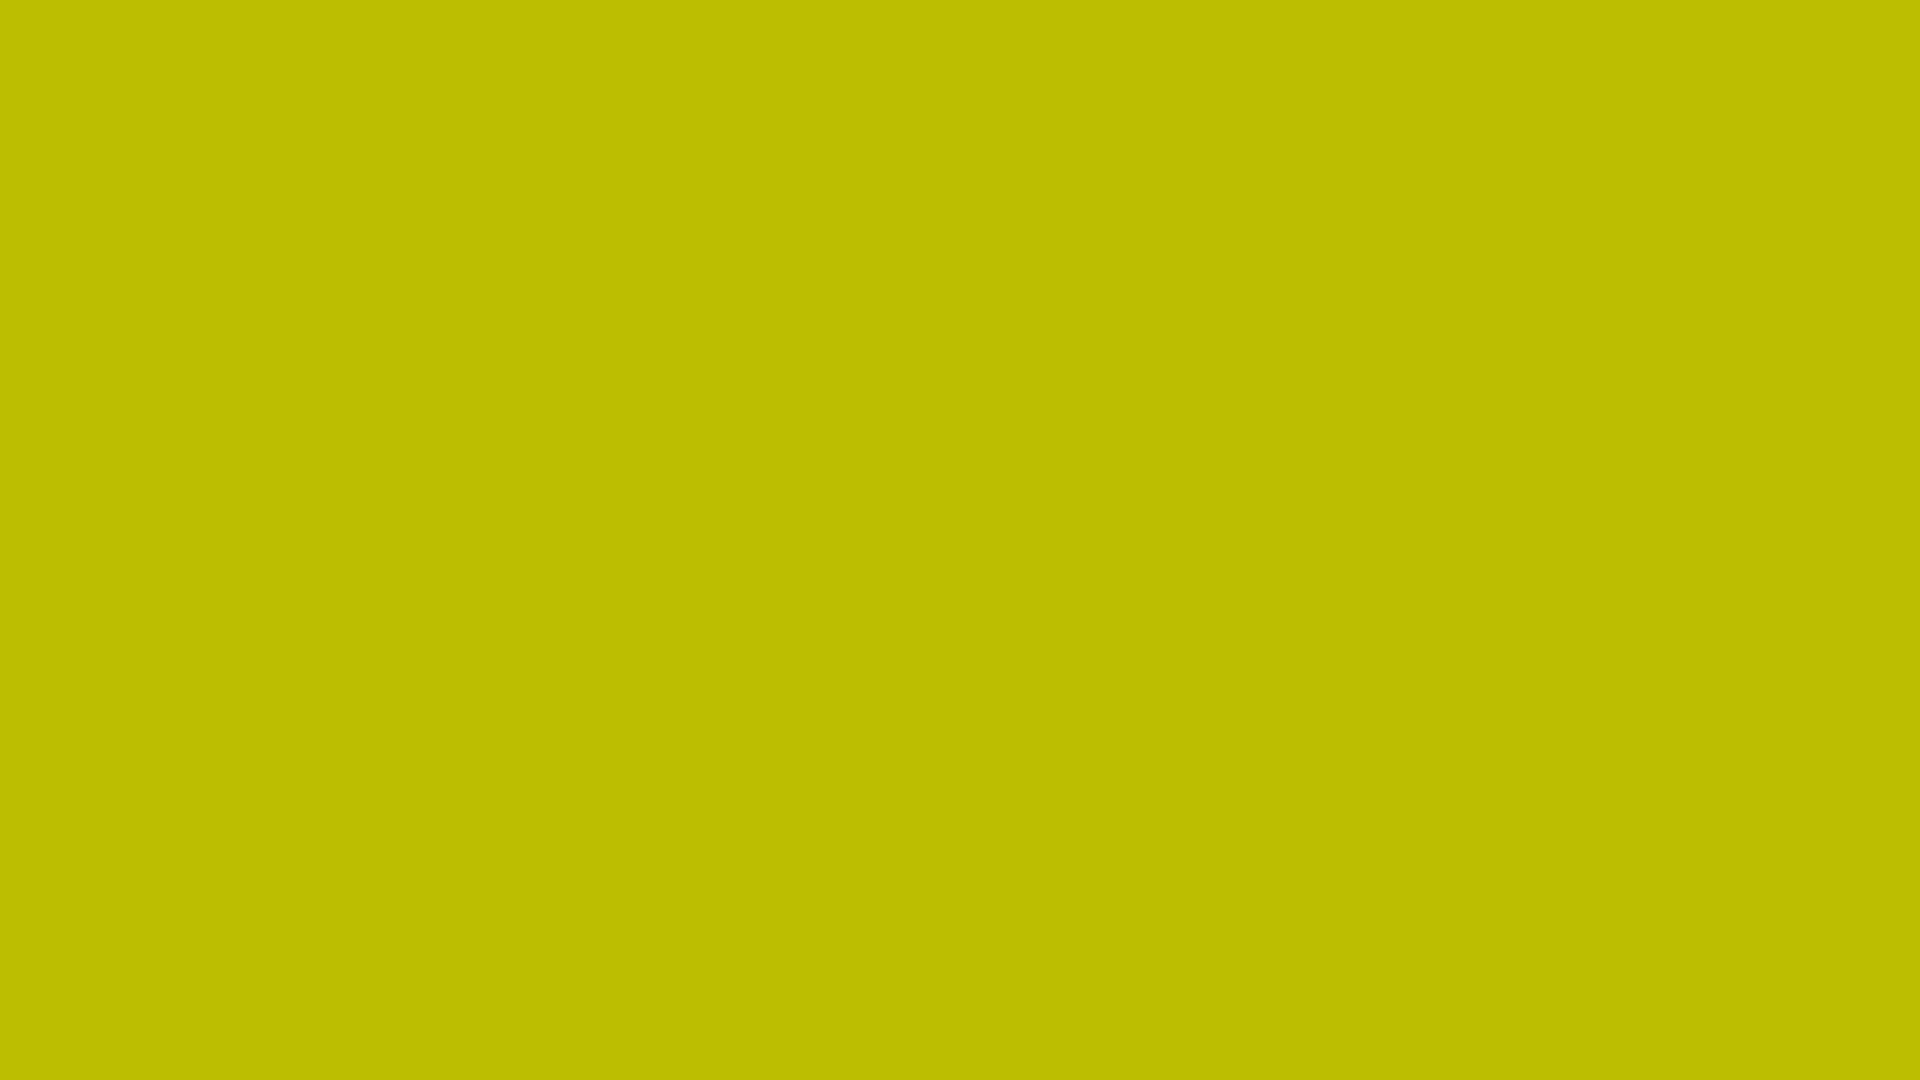 skooter_overlay-yellow-full4